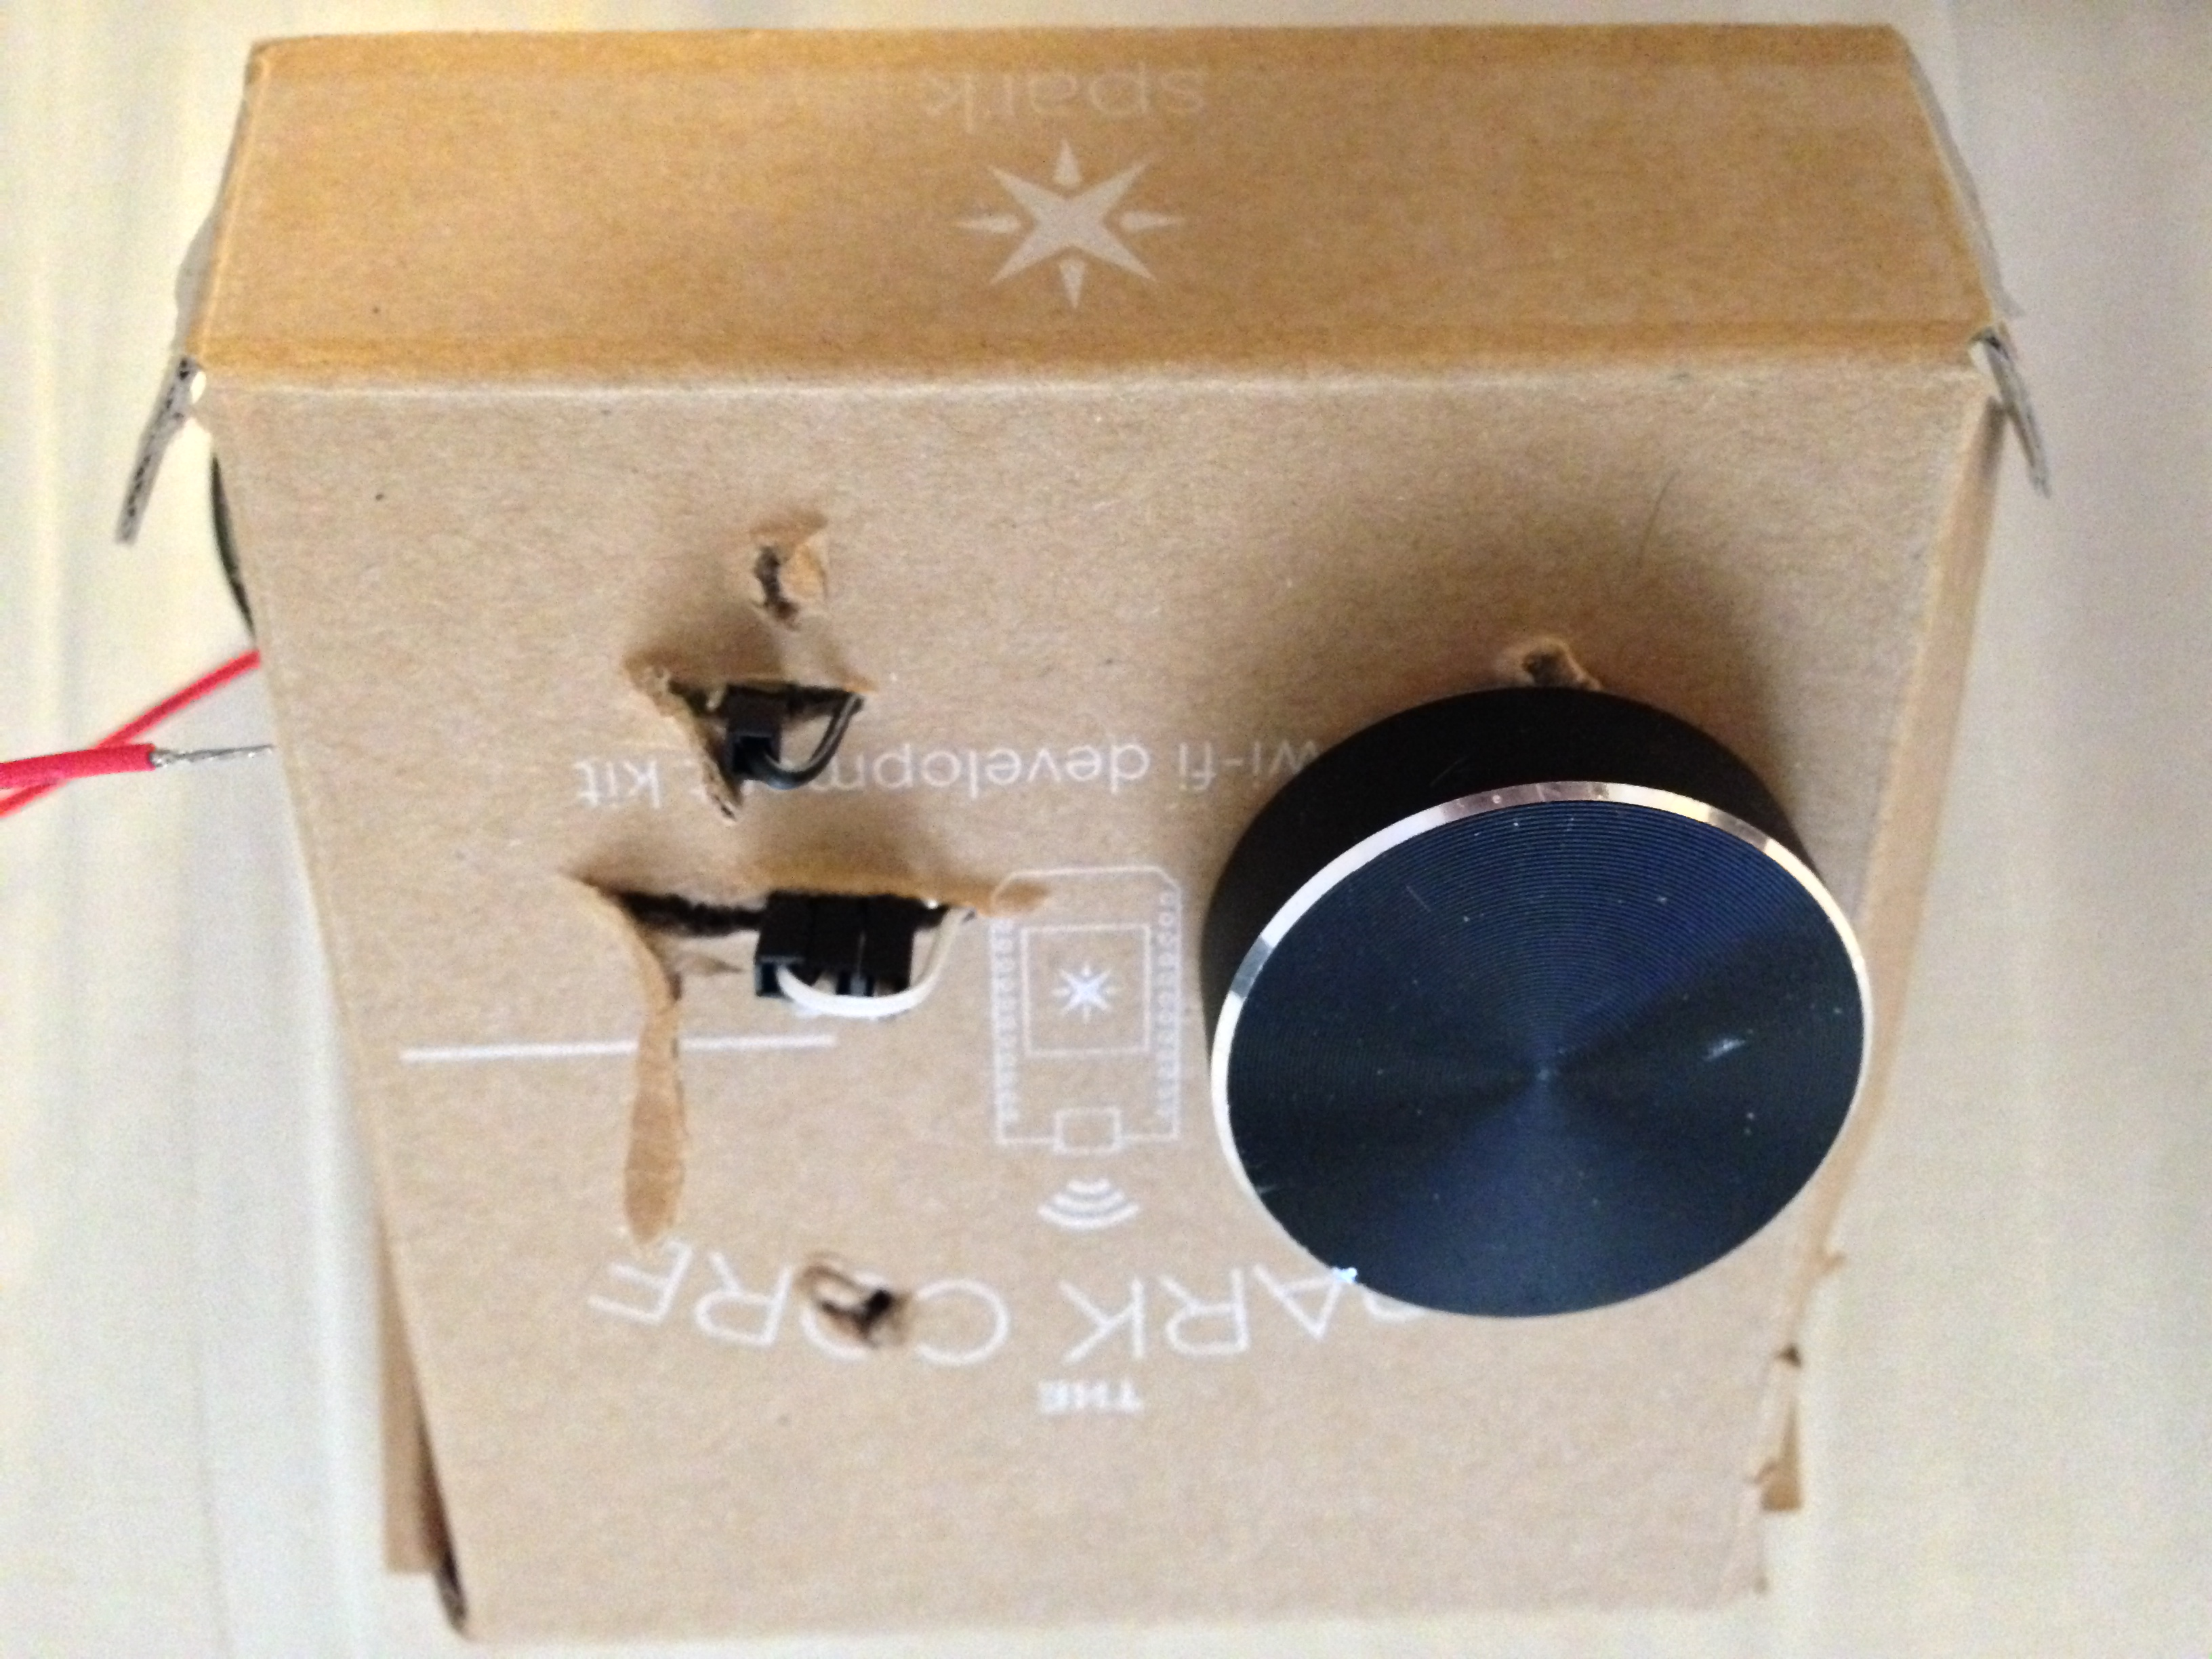 Creating a Bluetooth wireless scrollwheel